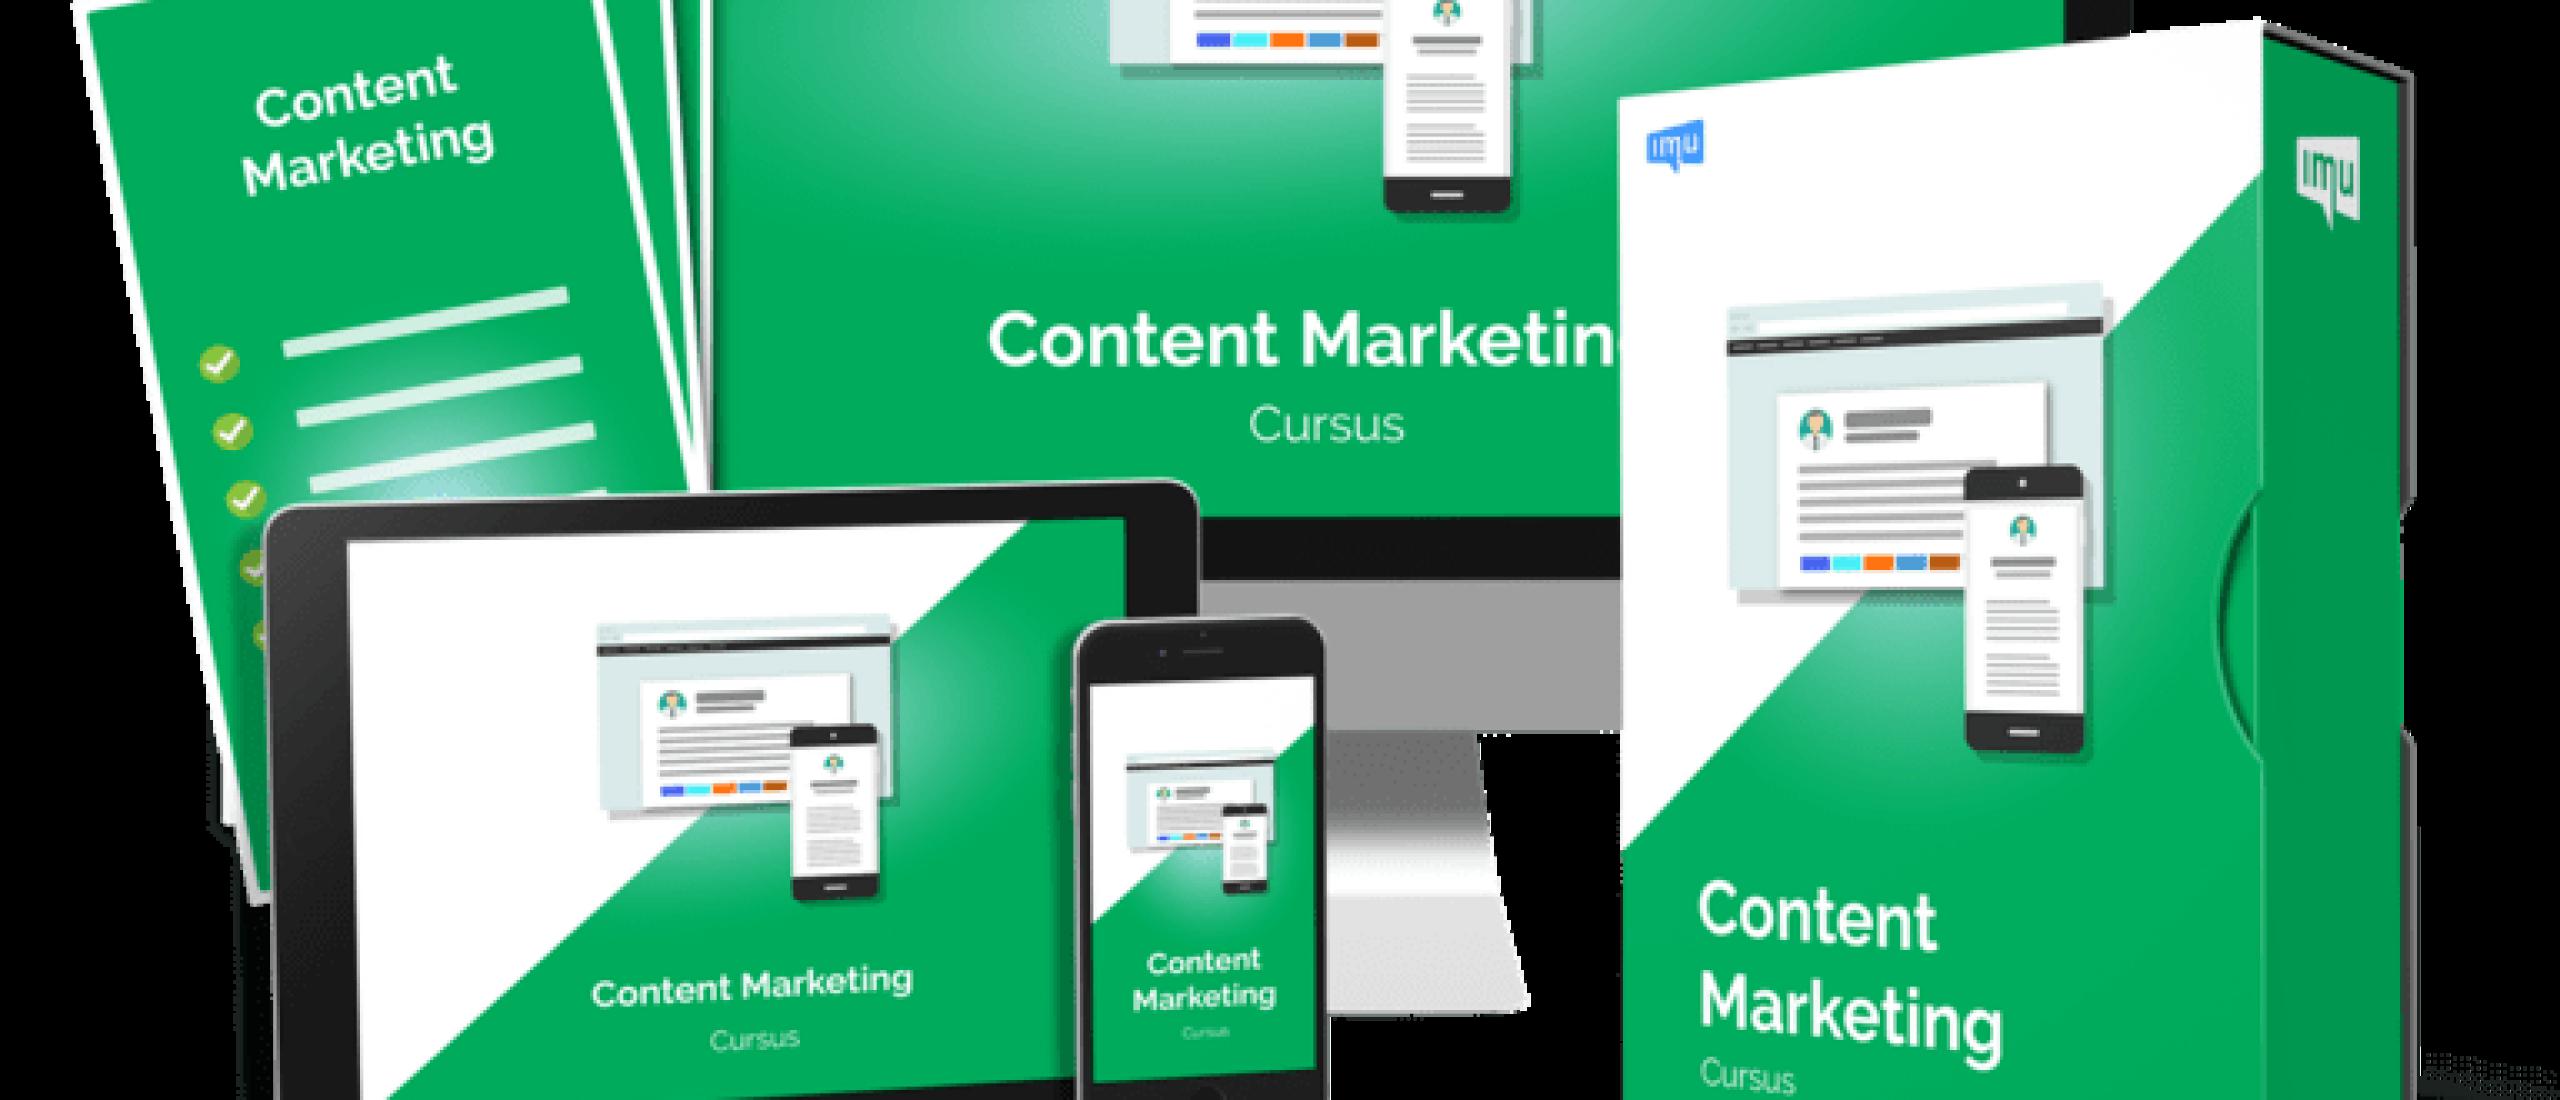 Review - Content marketing cursus om te scoren in Google